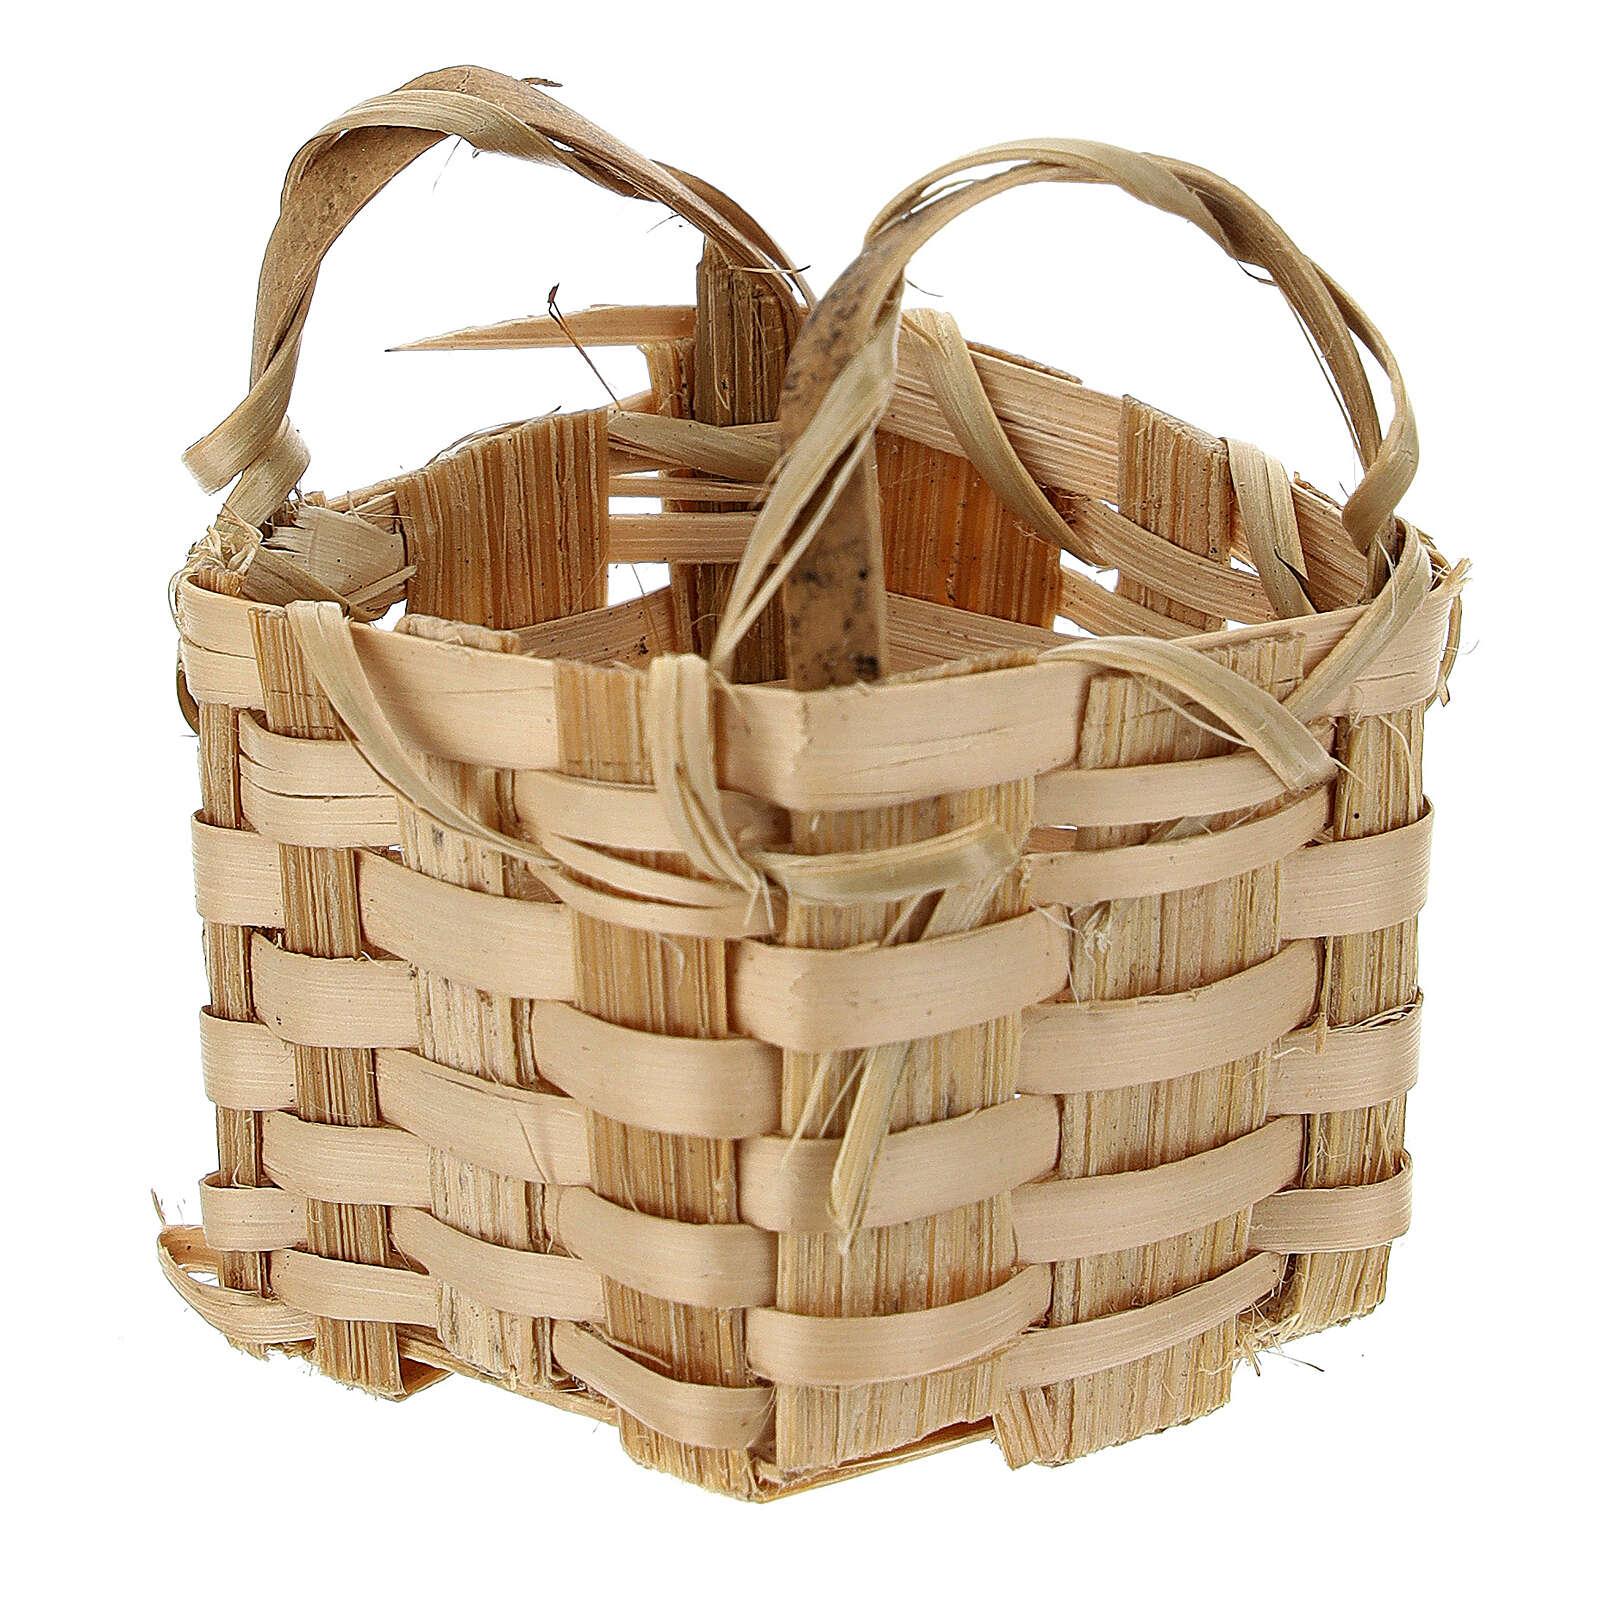 Wicker basket with handles 4x3,5x3 cm for Nativity Scene with 10 cm figurines 4